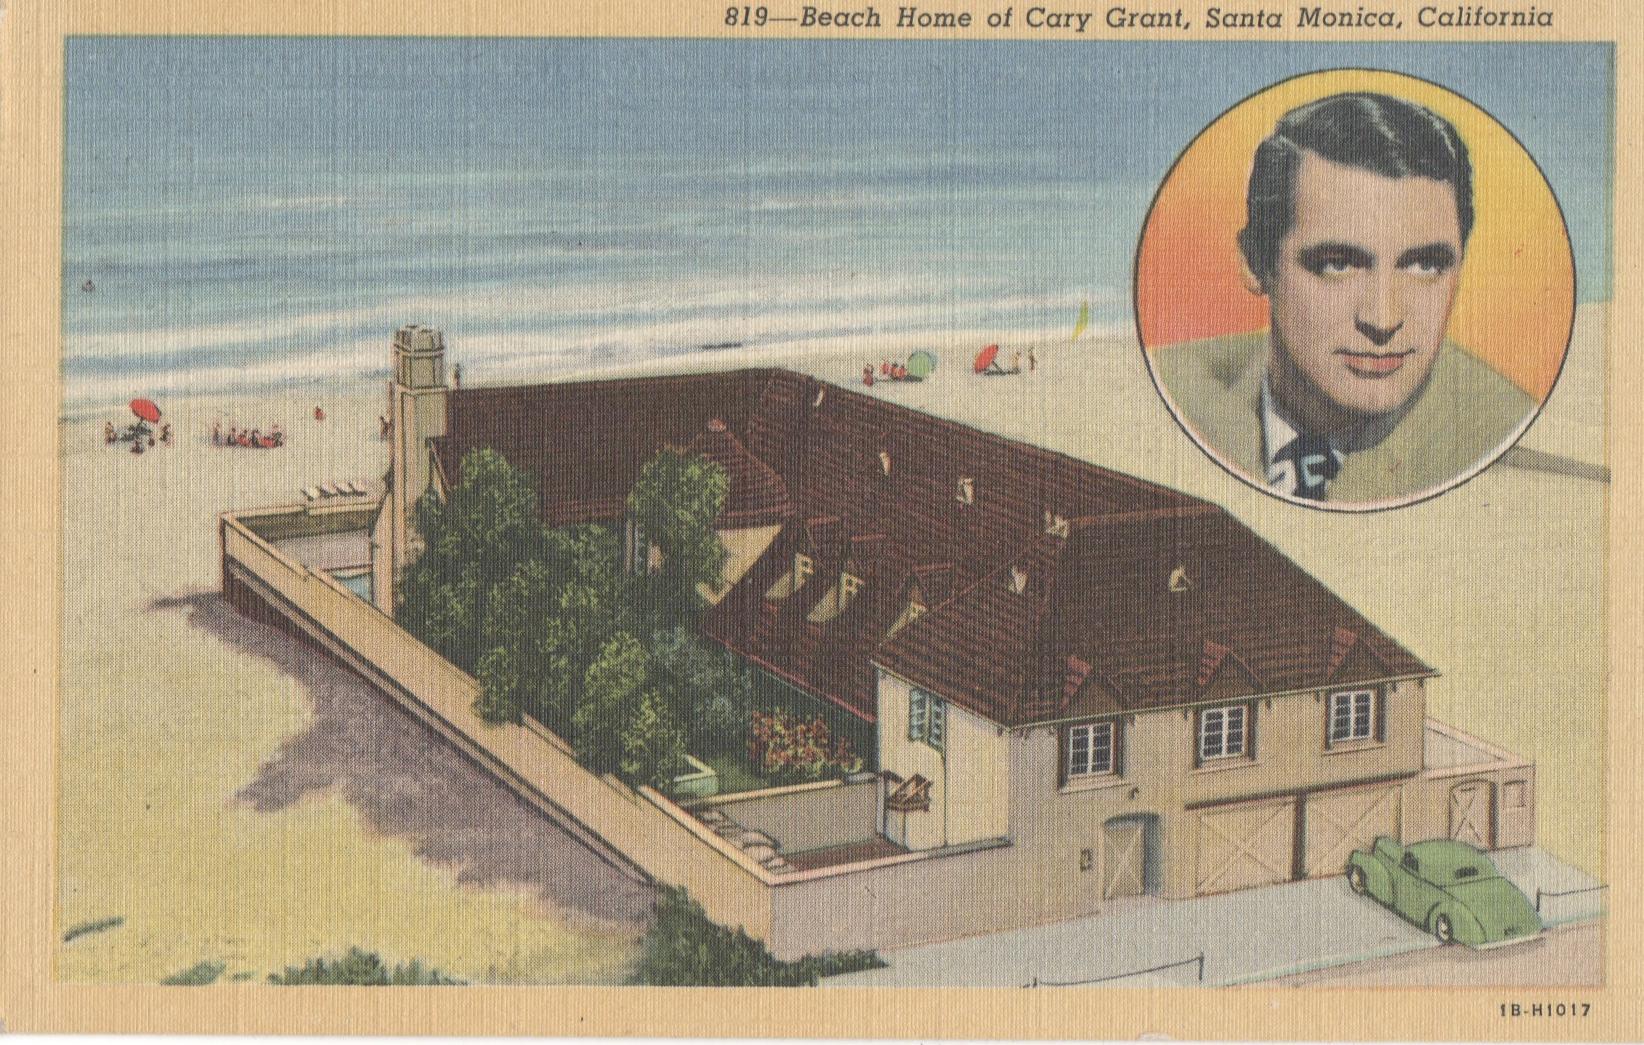 Cary Grant.jpg